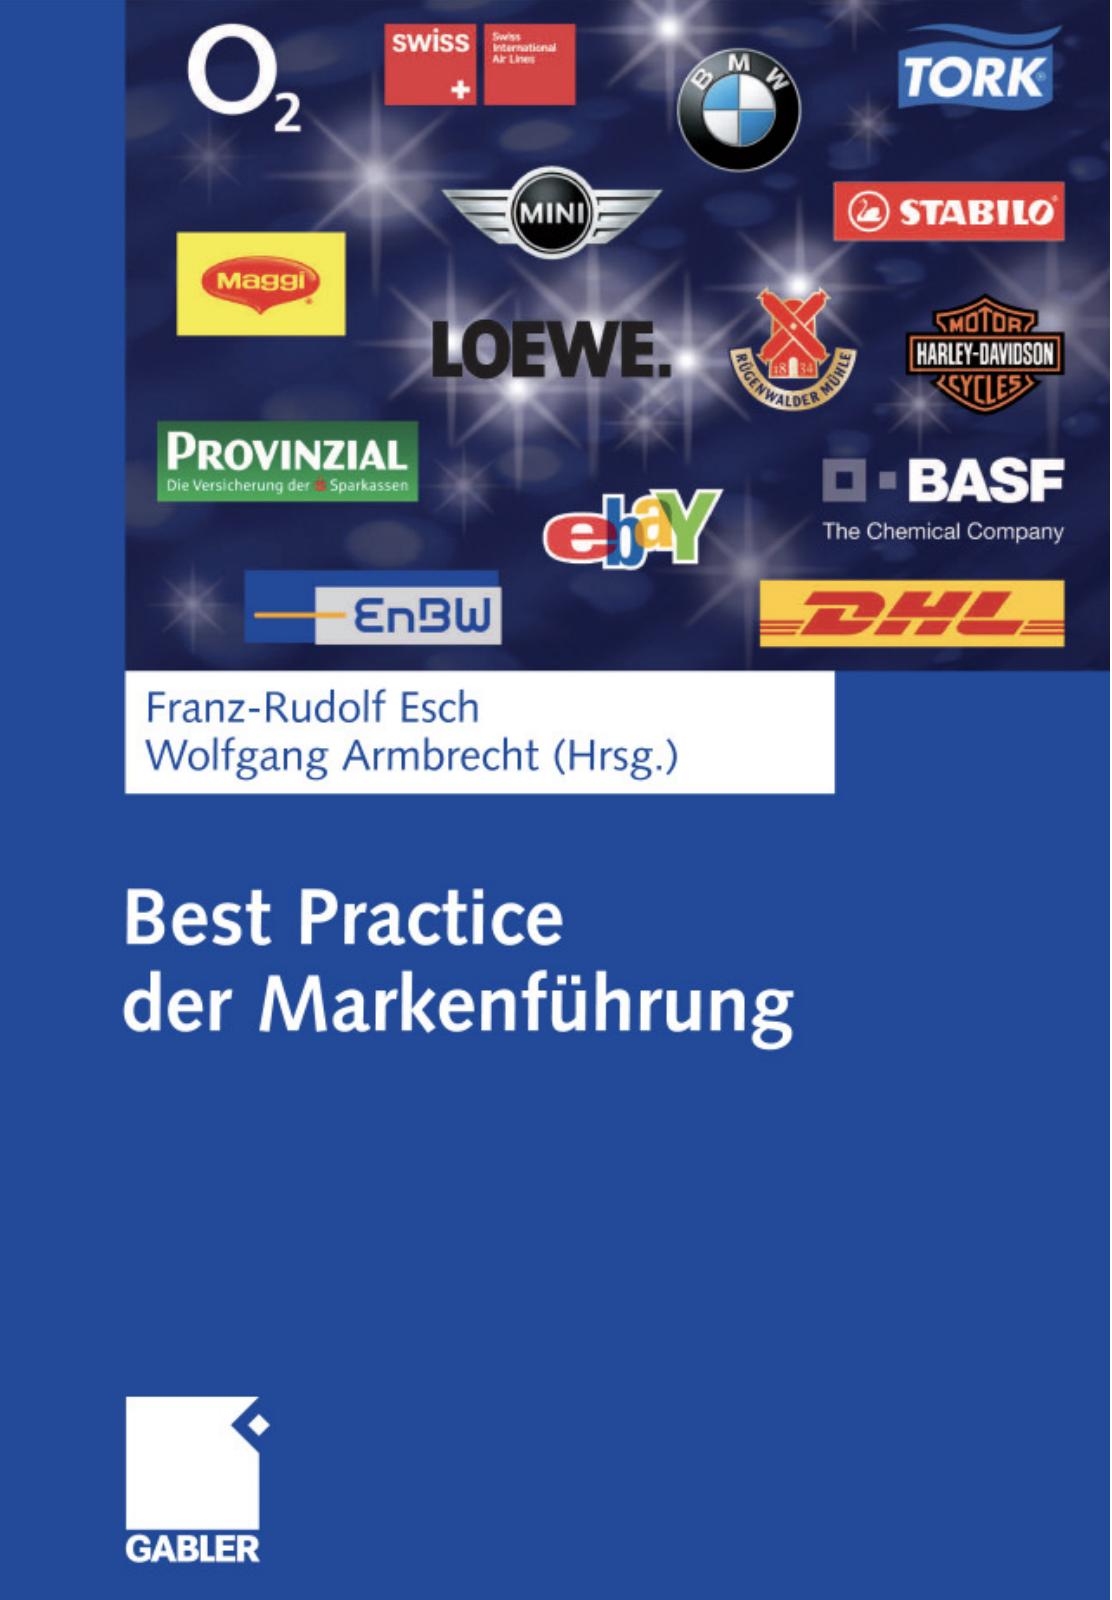 Expert Marketplace - Dr. oec. Hans-Peter Kleebinder - Best Practice Markenführung | Fallbsp. MINI